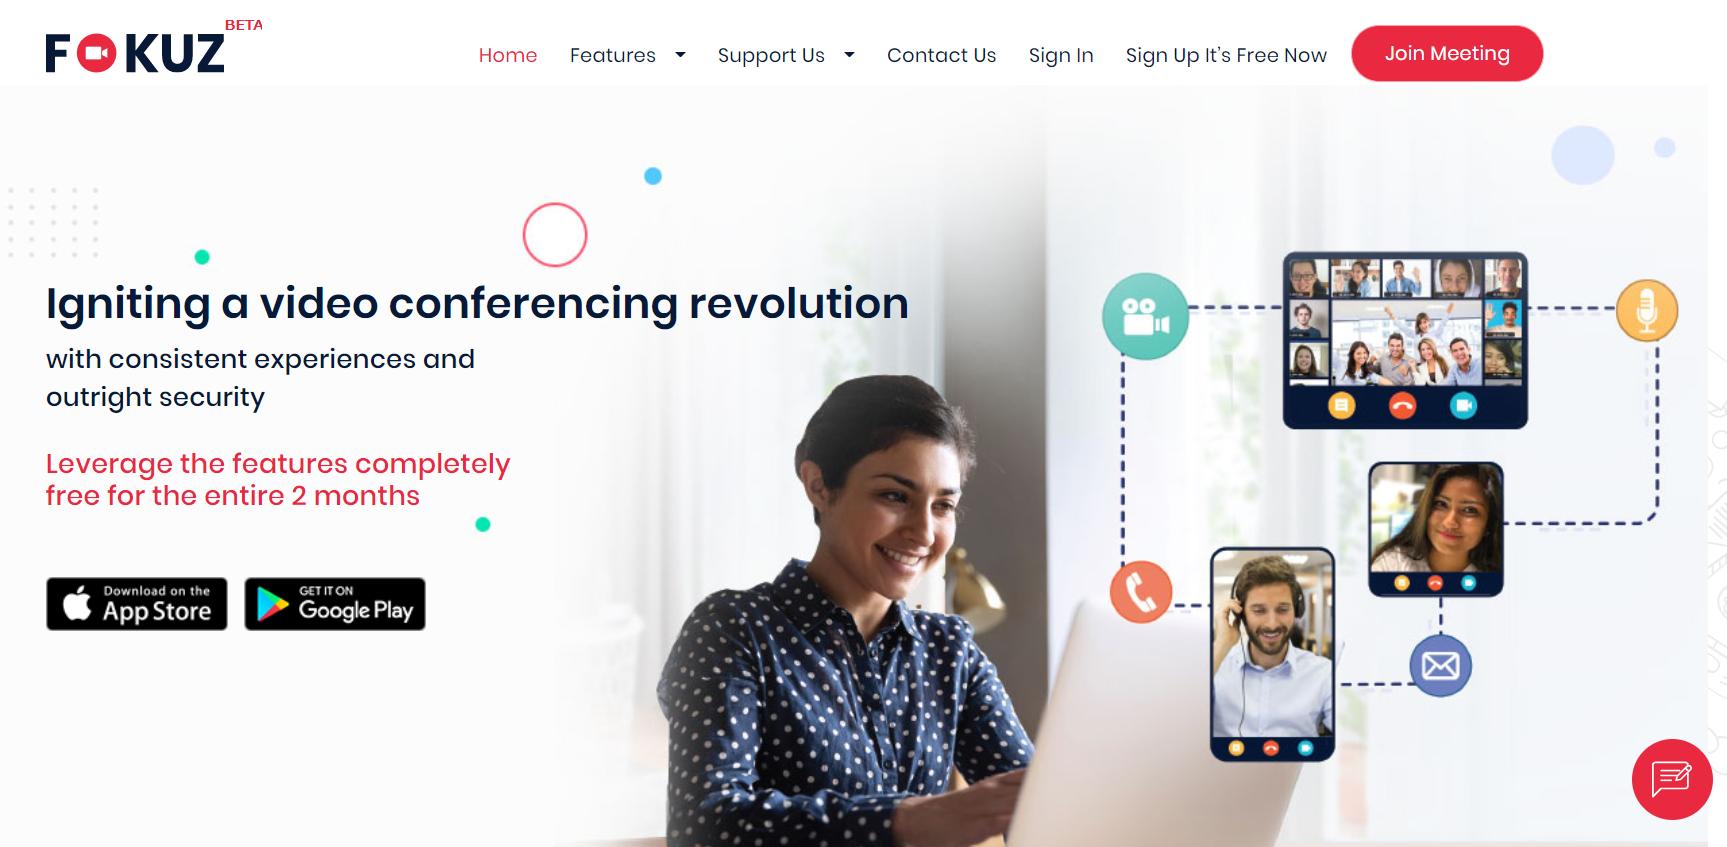 ZOOM、Google Meetの競合と目されるインド発「Fokuz」とは?